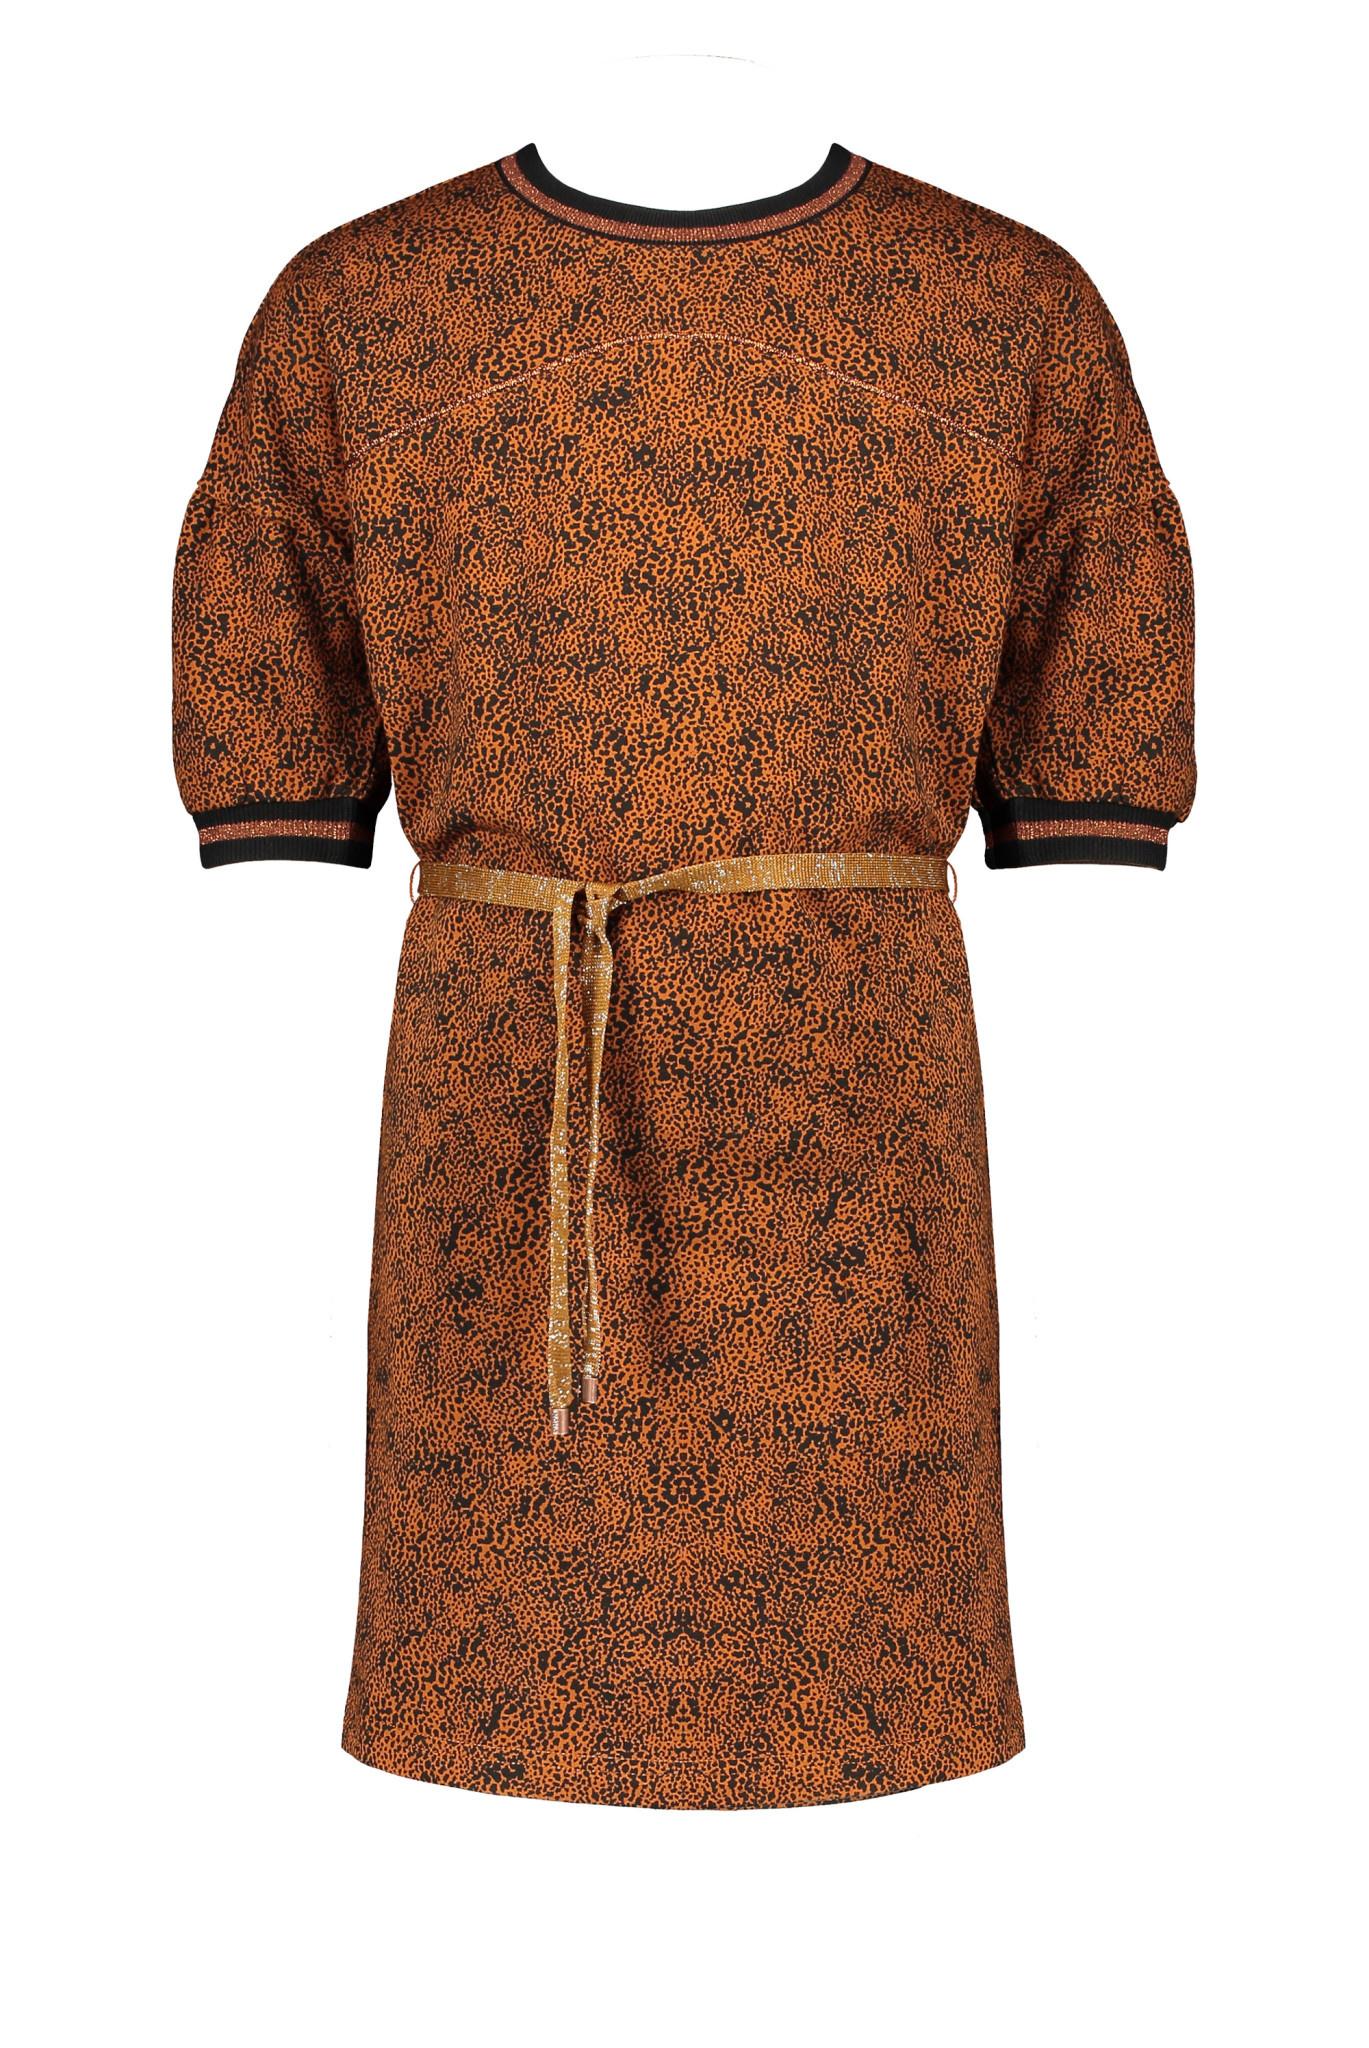 Milly Leopard Print Dress